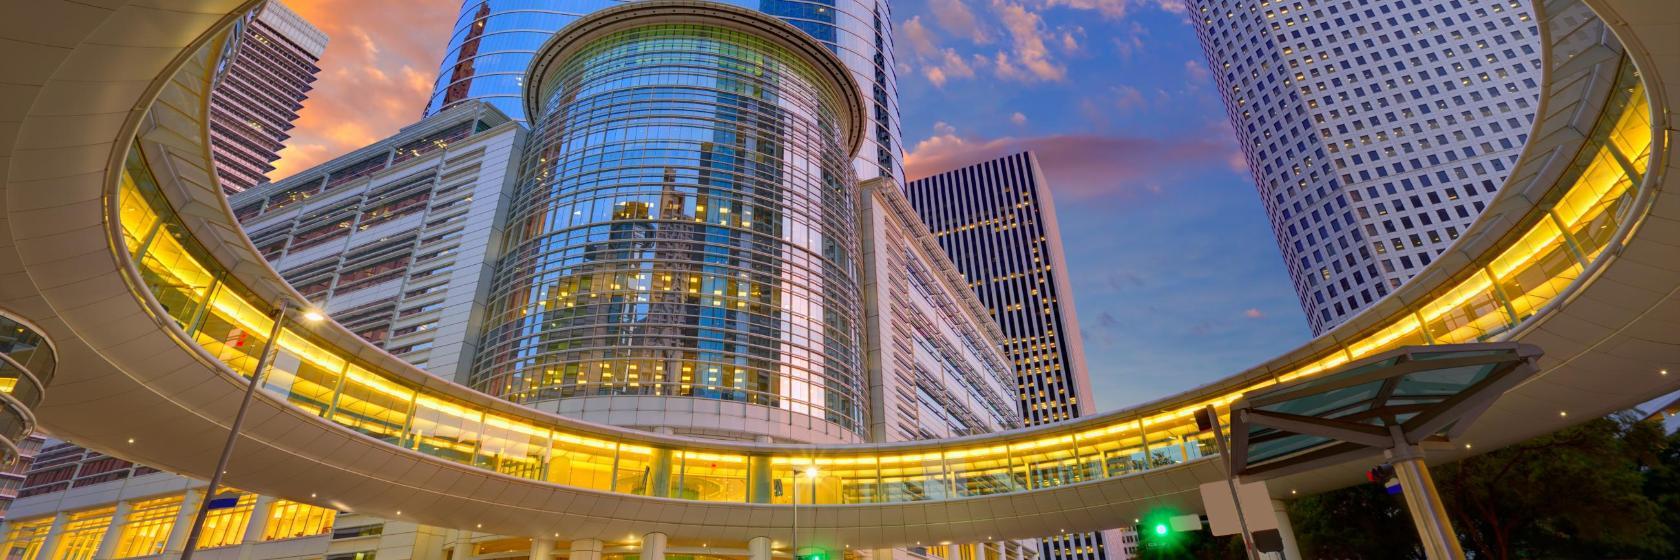 Houston, Texas Hotels